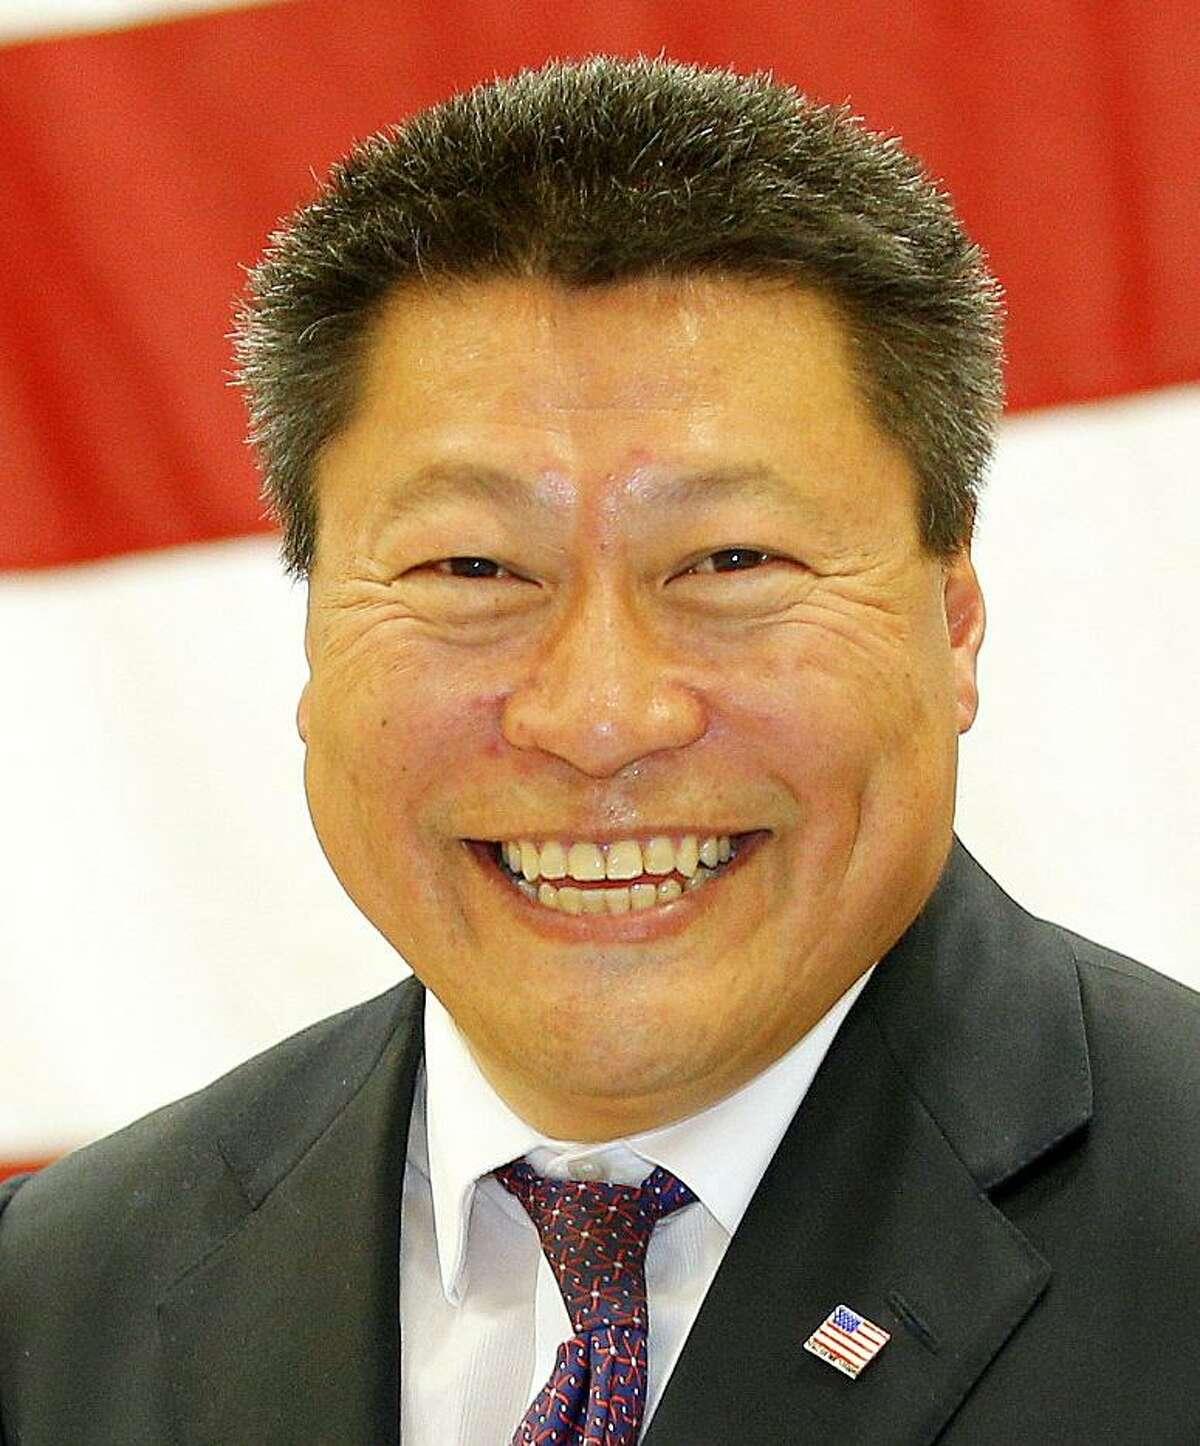 State Sen. Tony Hwang, R-Fairfield